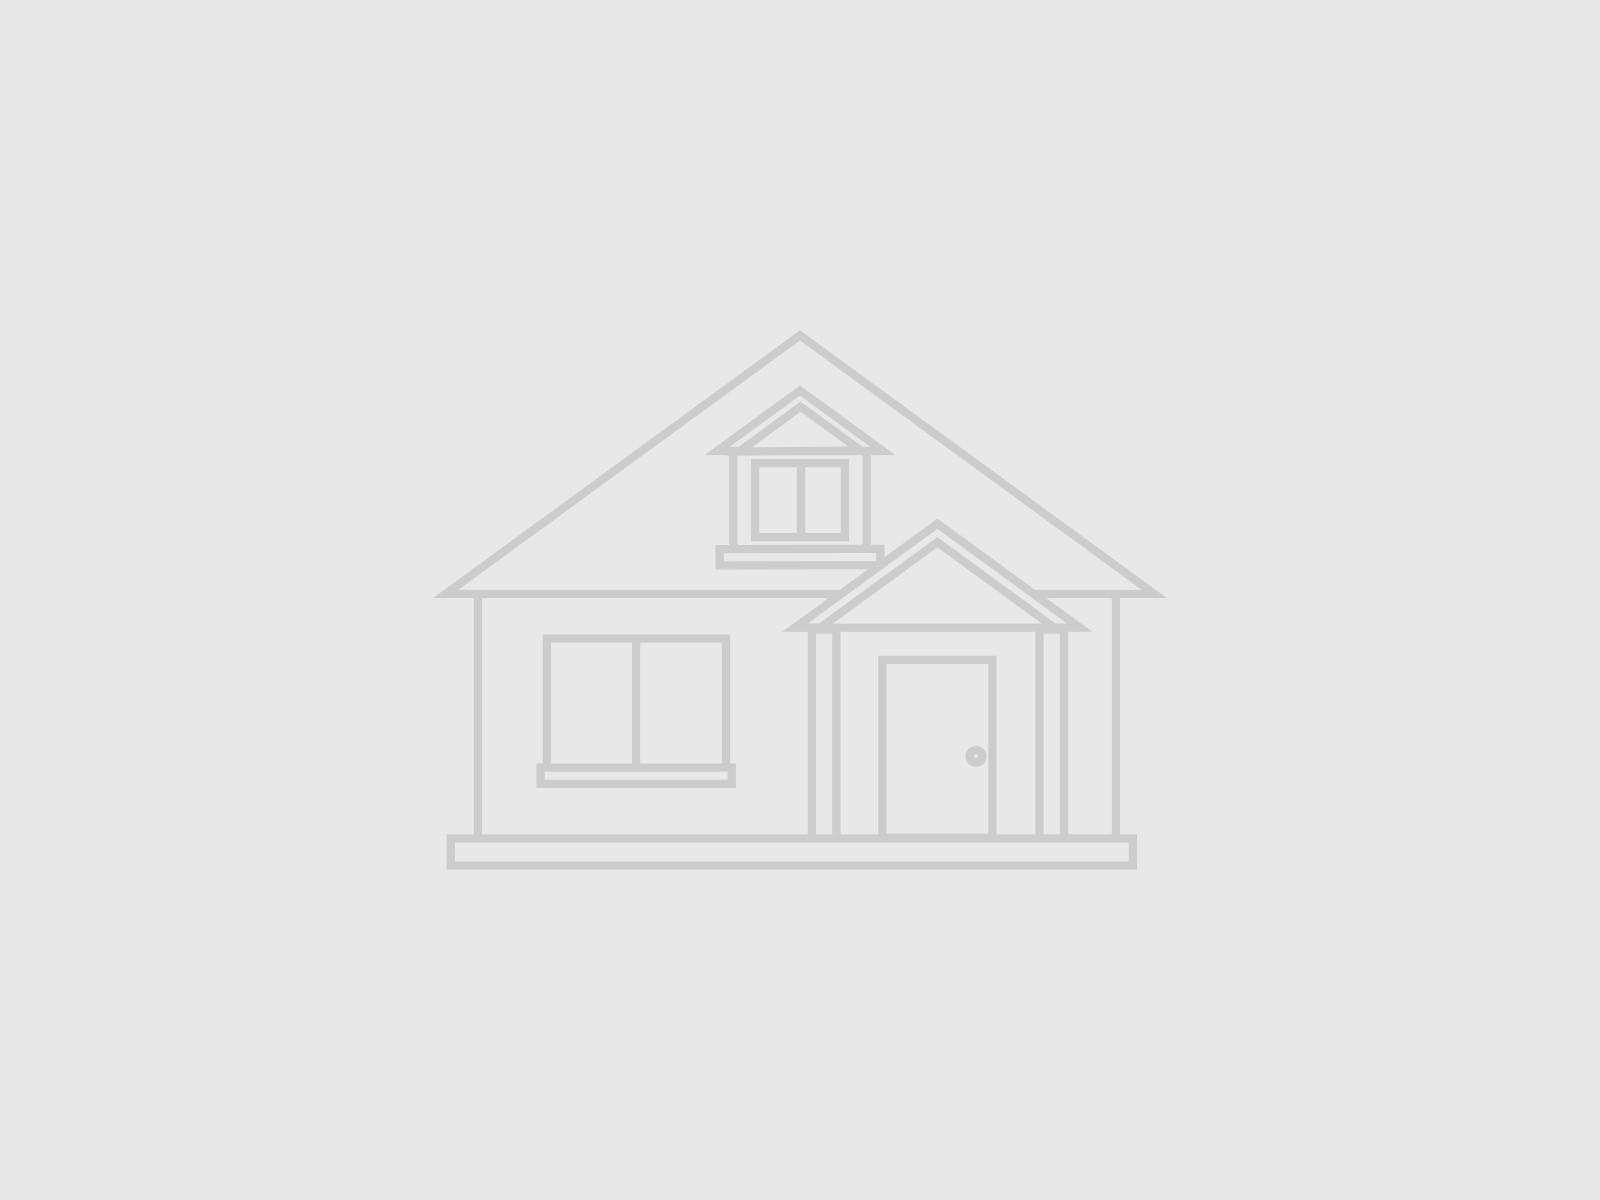 755 el pomar road 632 a luxury single family home for sale in broadmoor colorado springs, colorado property id 7739984 christie s international real estate